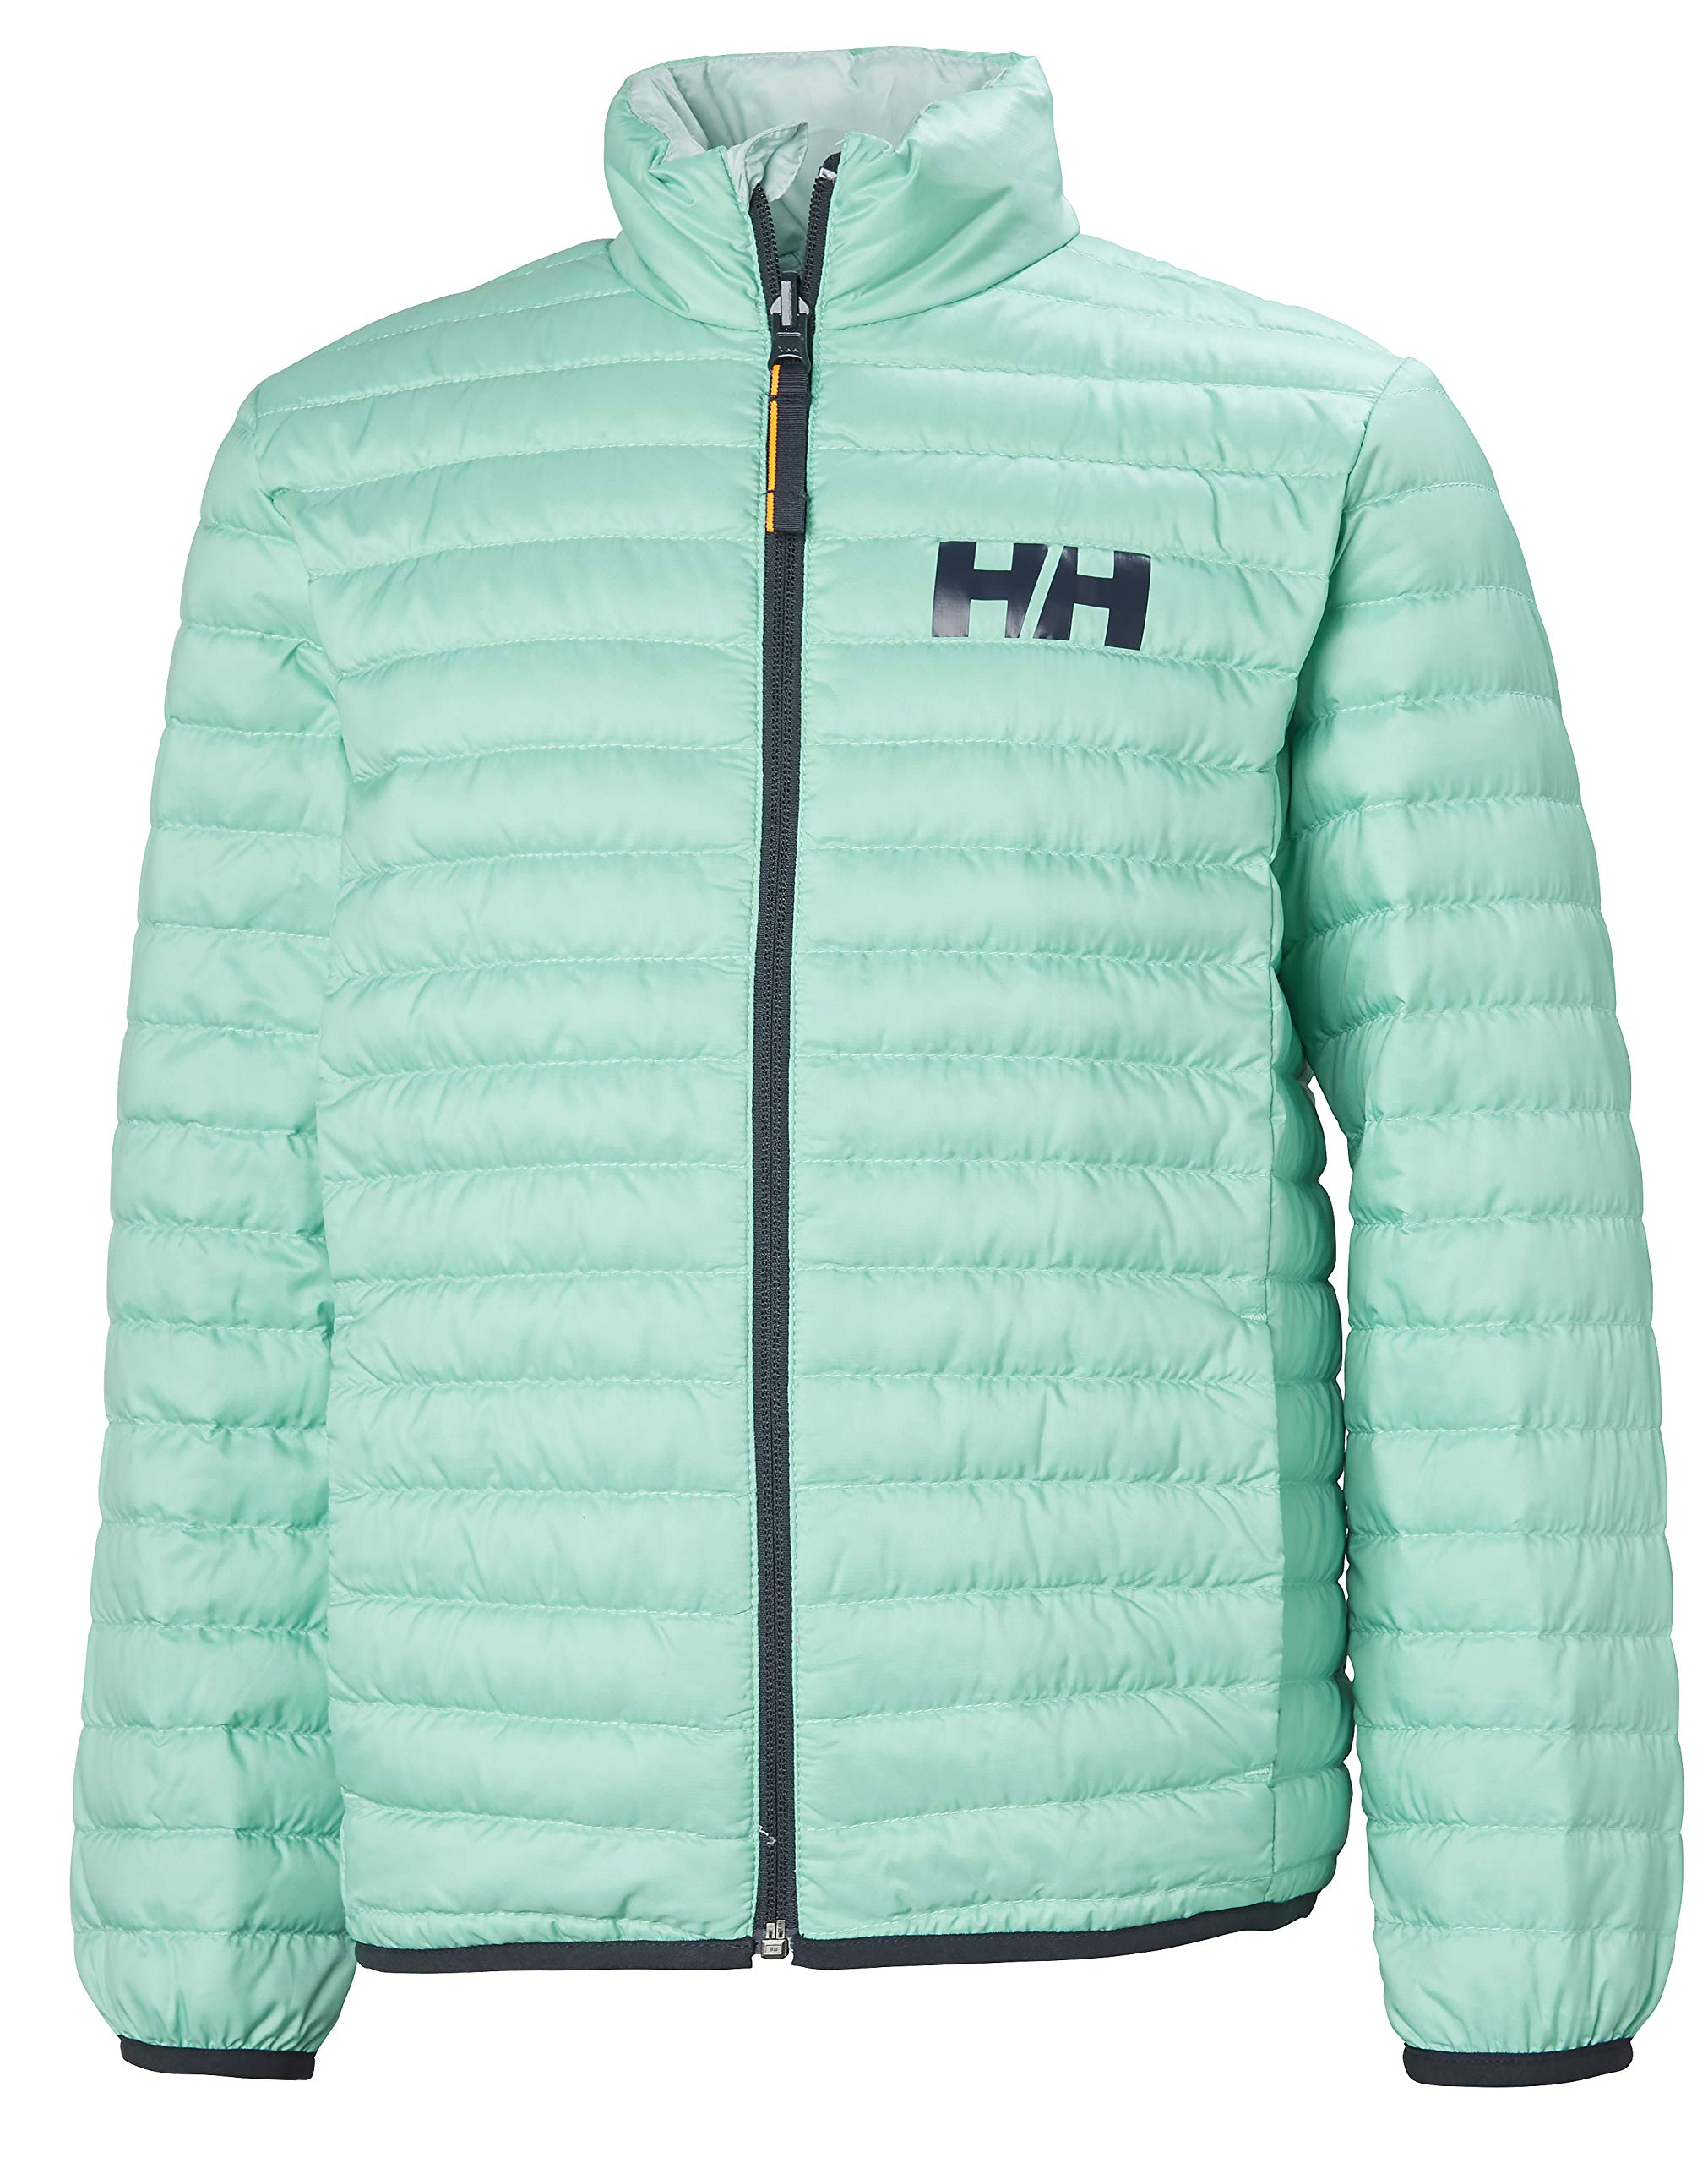 Helly Hansen Jr Barrier Down Insulator Jacket, Pool Blue, Size 8